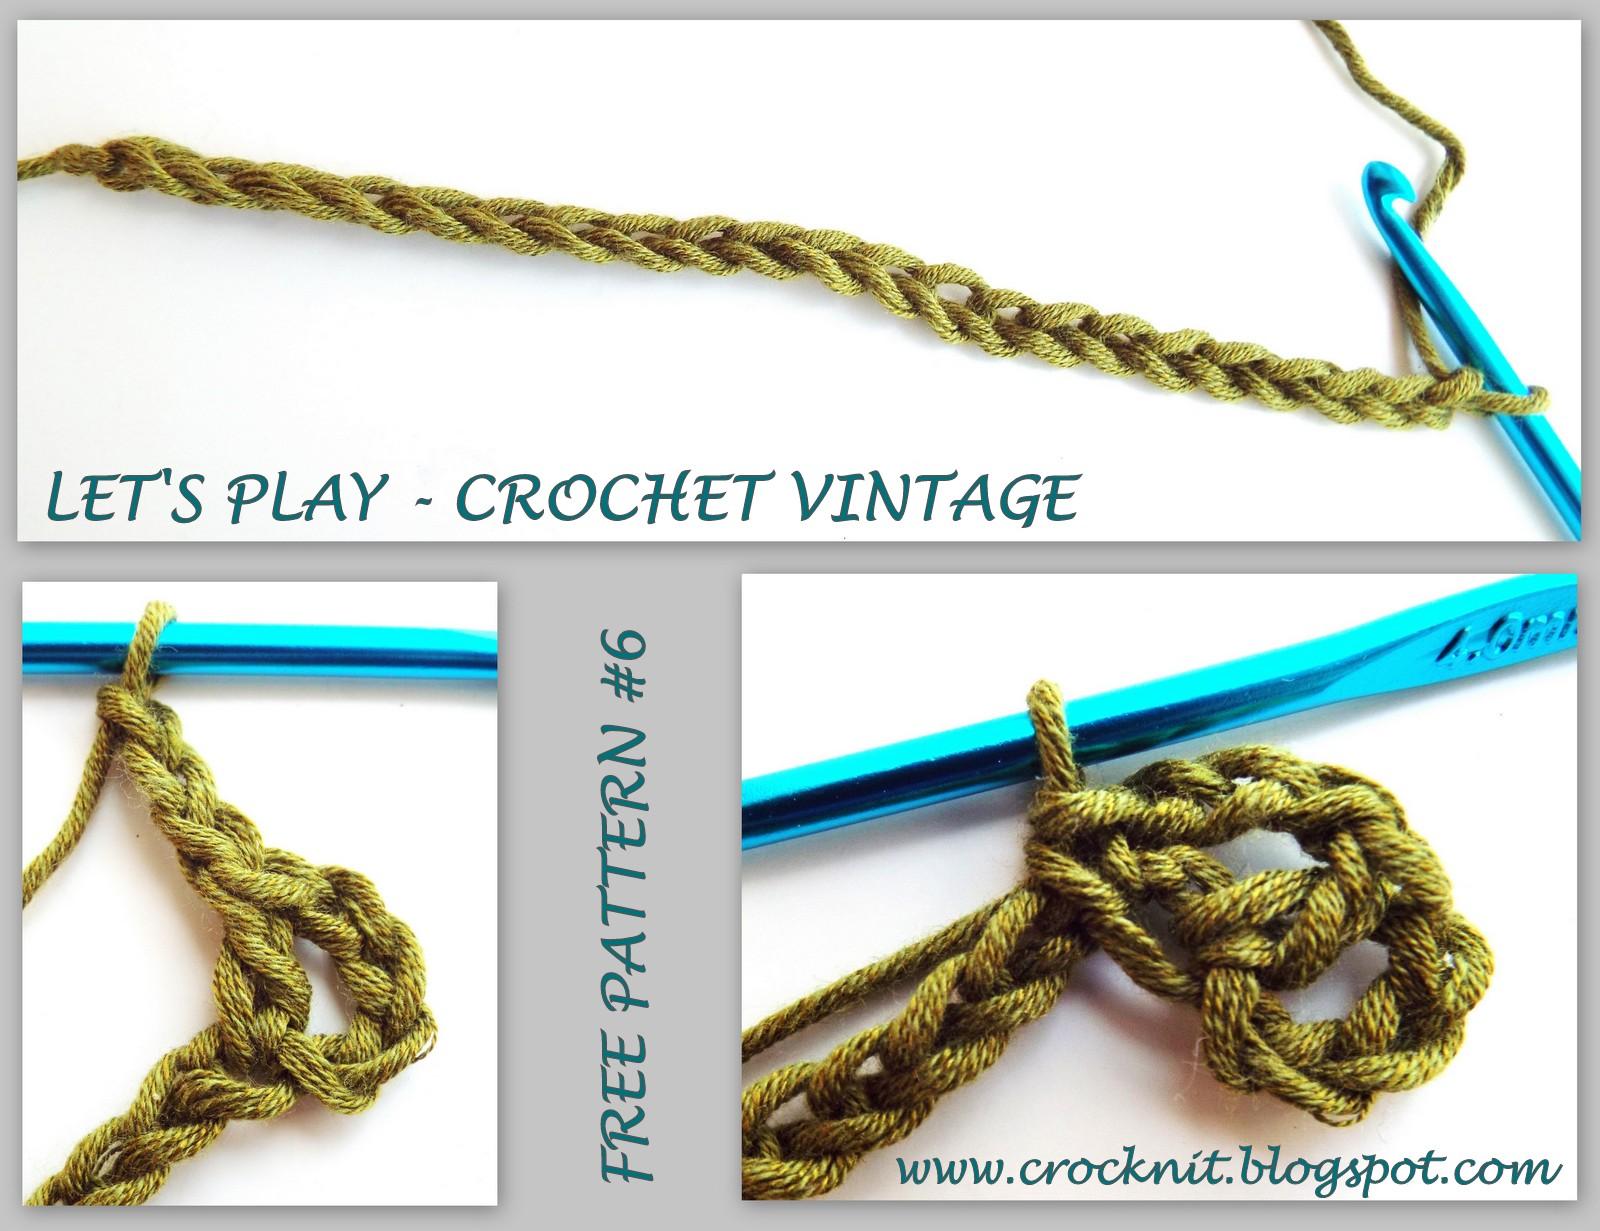 Crochet Stitch Rtrb : Row 1: (1dc, ch3, 1sc) in 5th ch from hook, *skip 3ch, (2dc, ch3, 1sc ...